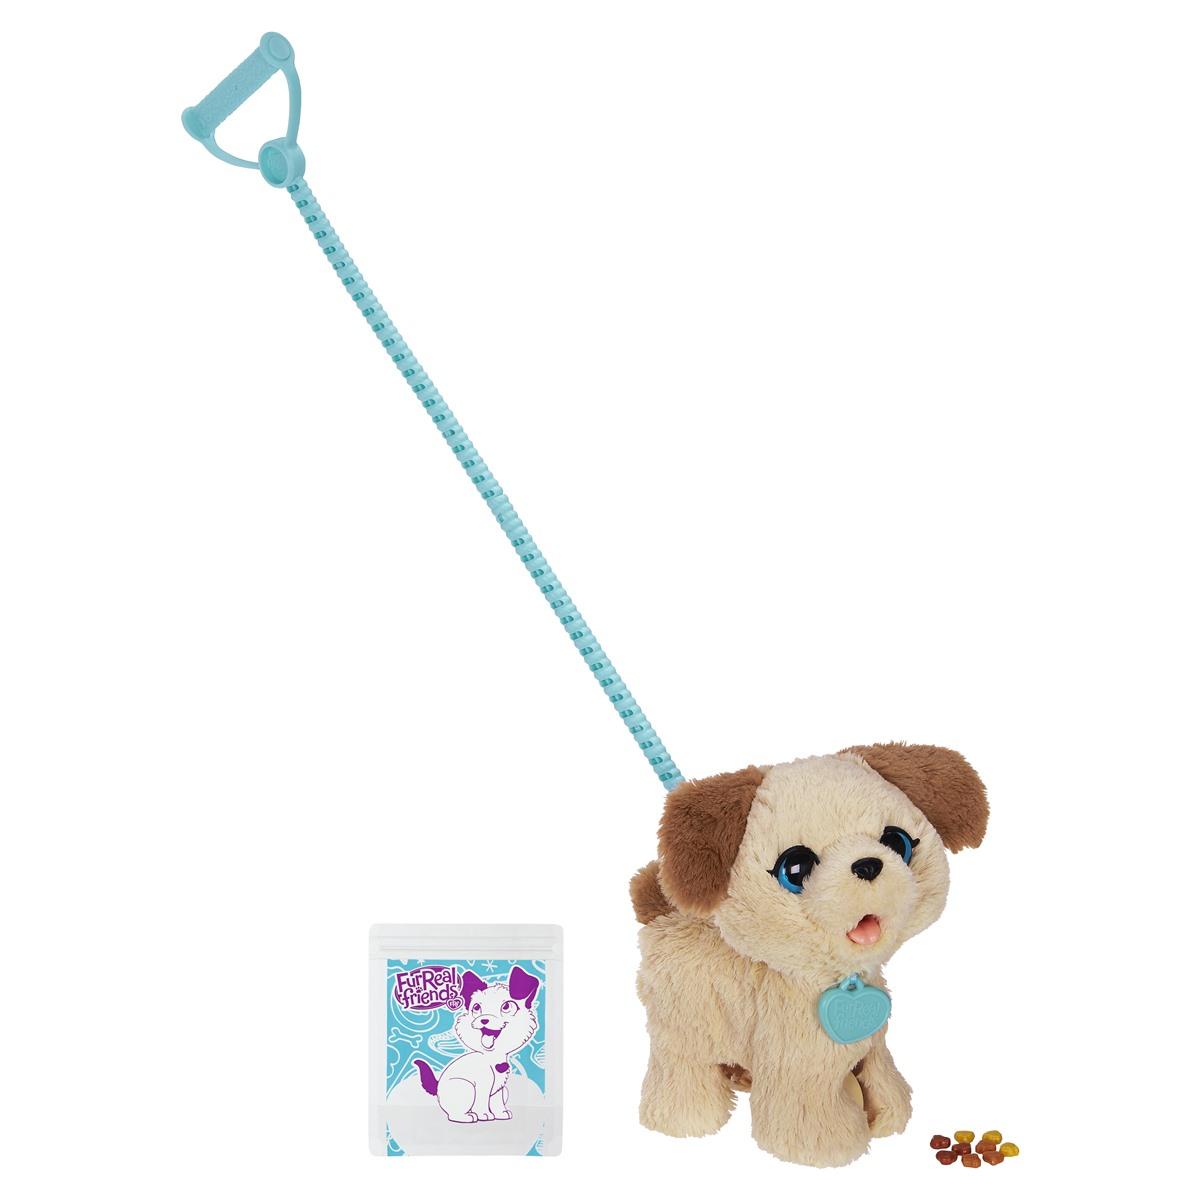 Toy Dog On Lead That Walks